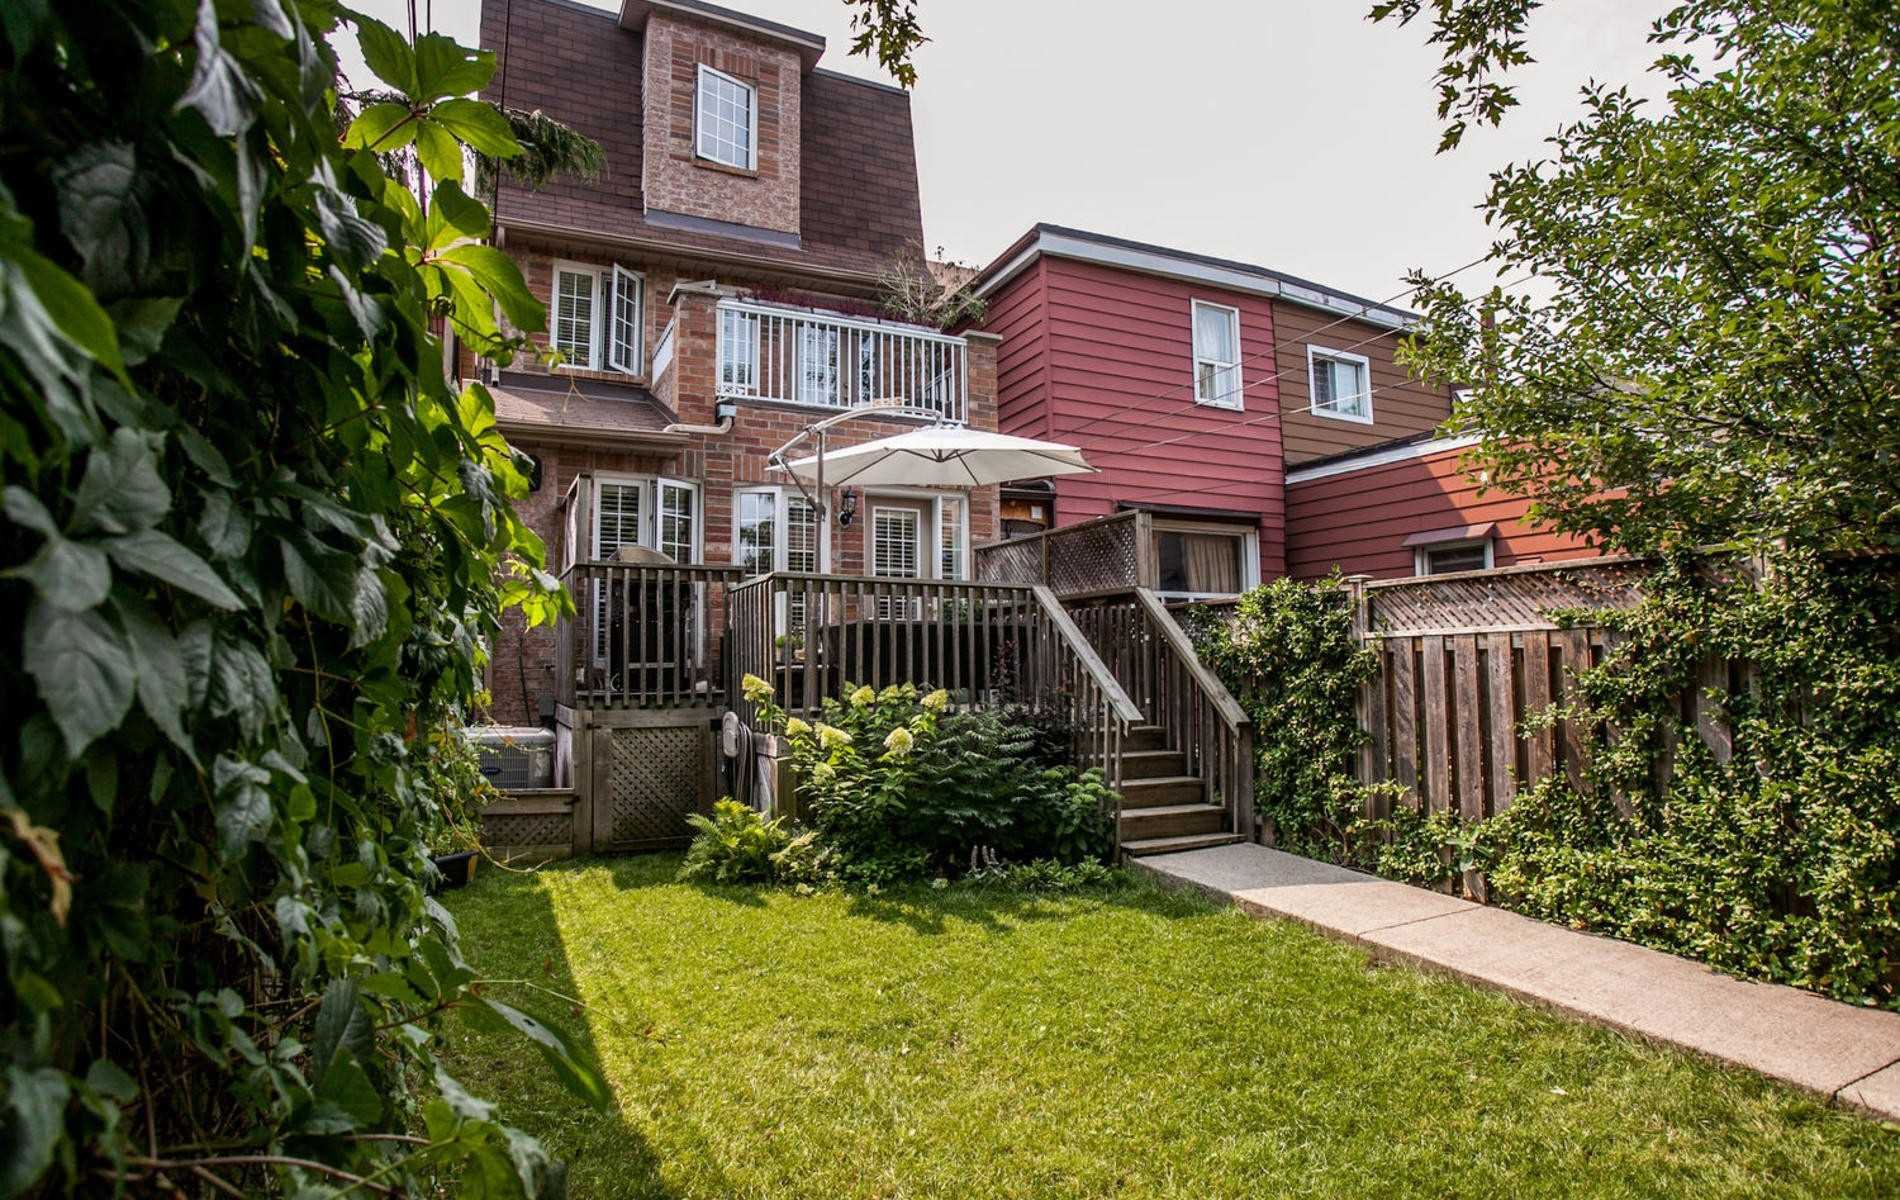 Photo 19: Photos: 119 Carlaw Avenue in Toronto: South Riverdale House (3-Storey) for lease (Toronto E01)  : MLS®# E4386176